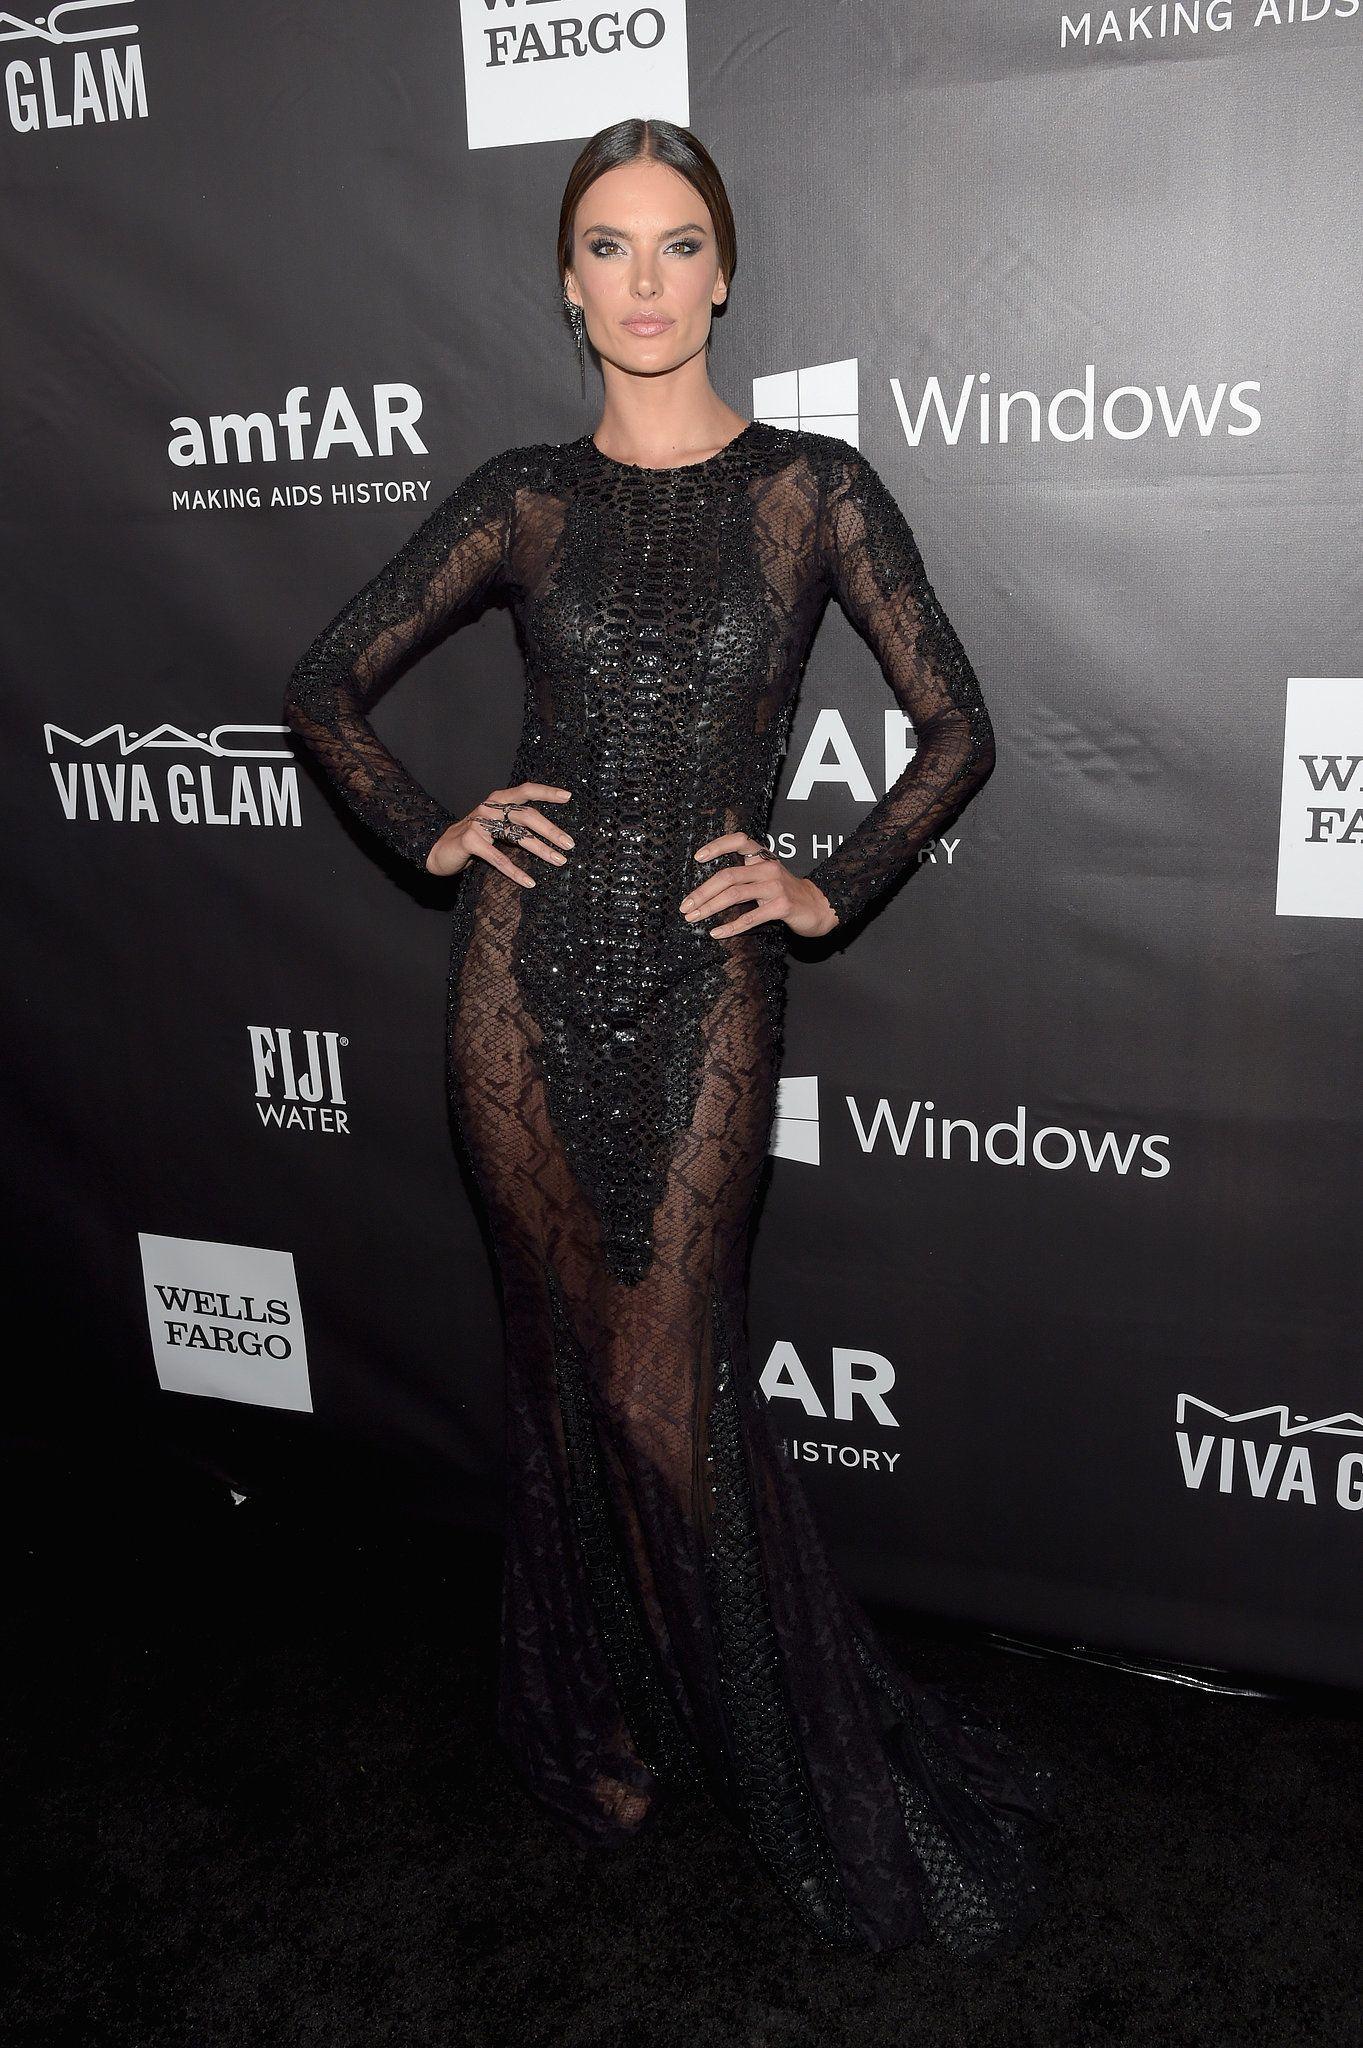 Alessandra Ambrosio in a Spring '15 Zuhair Murad dress at the 2014 amFAR Inspiration Gala.